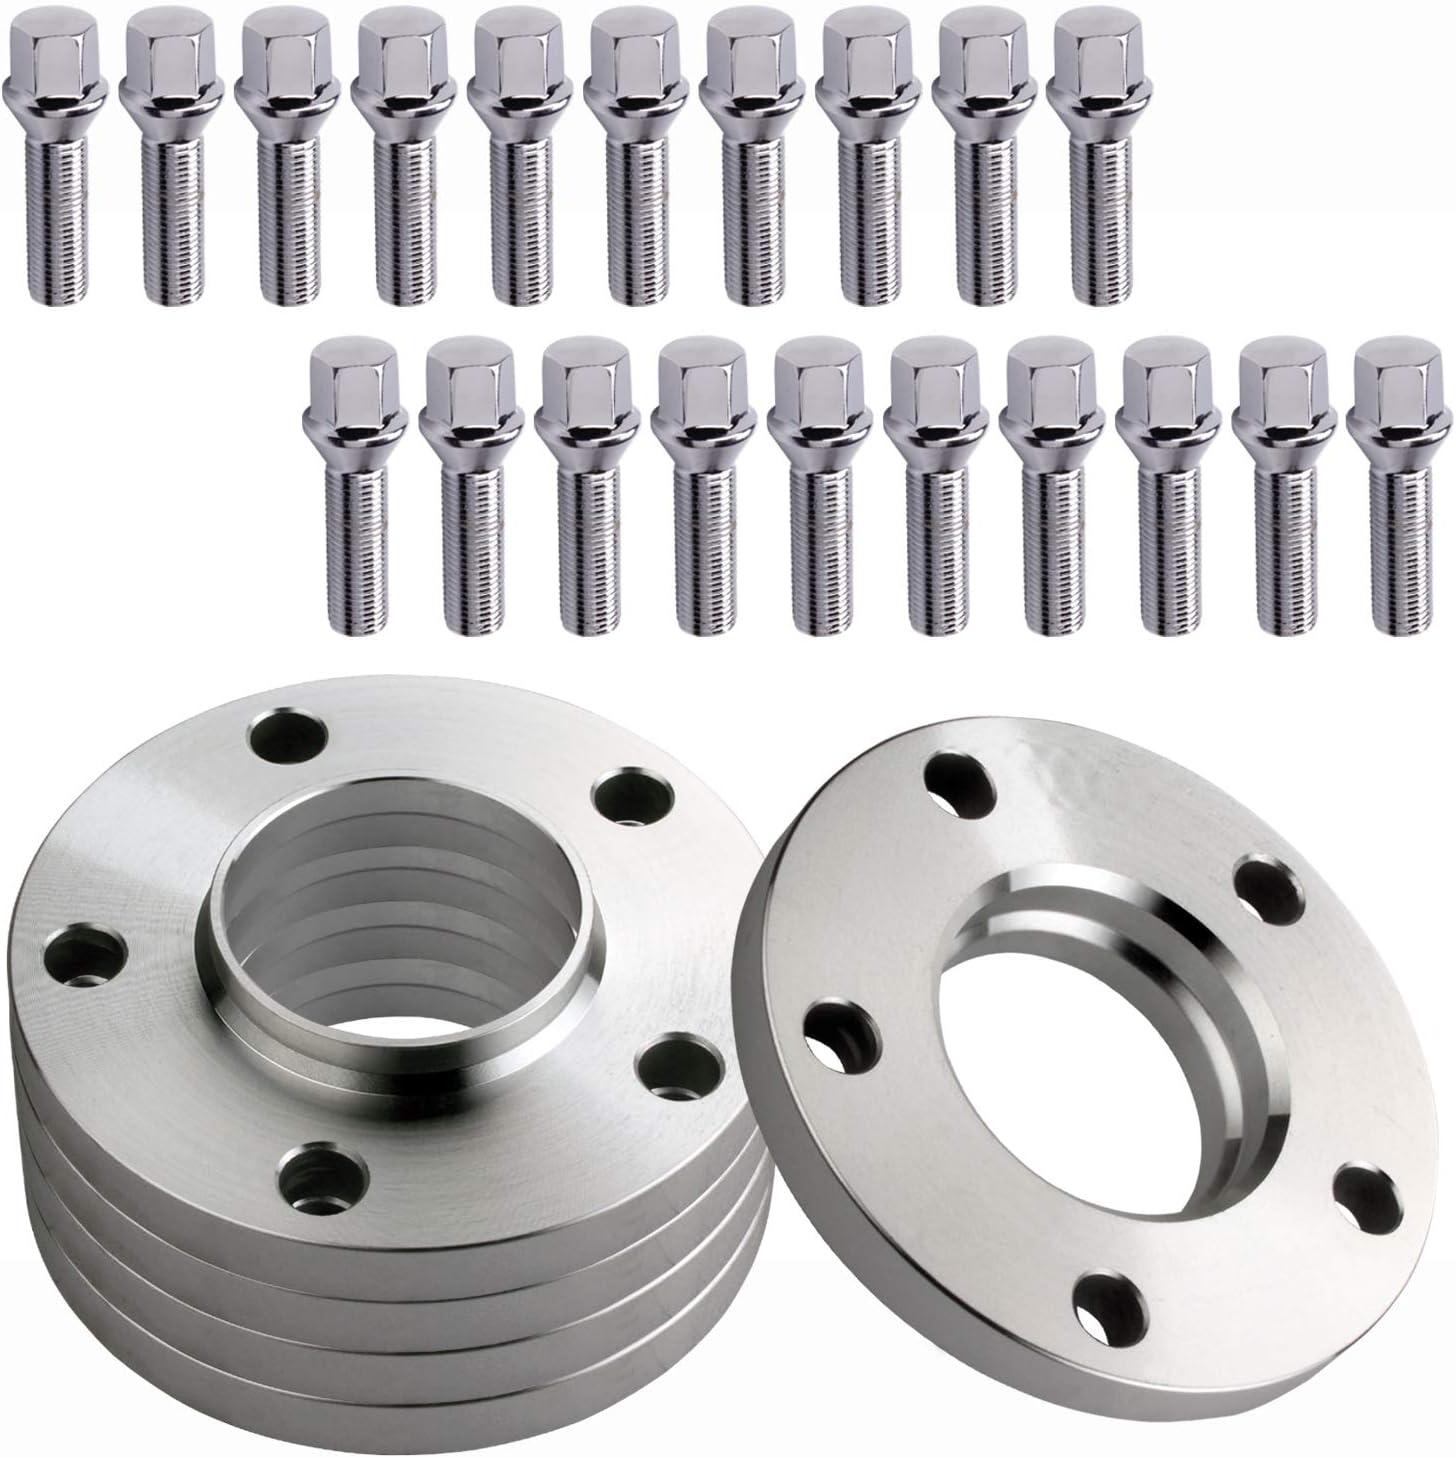 15mm /& 20mm Wheel Spacers 5x120 12x1.5 For BMW 3 SERIES E30 E36 E46 E90 2 2